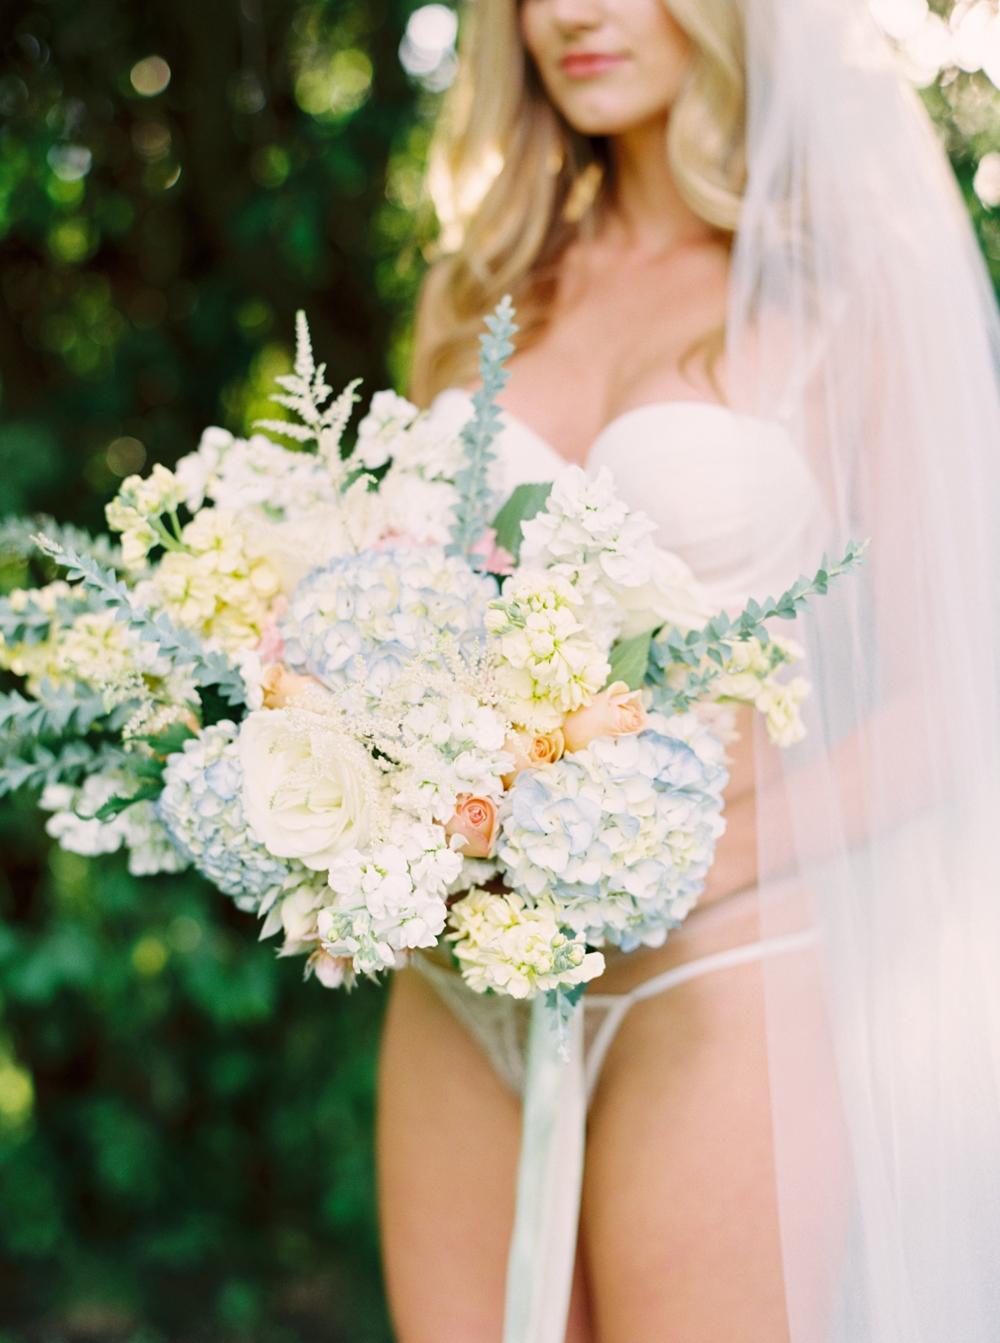 Calgary Wedding Photographer | Boudoir Photography | Edmonton outdoor boudoir session